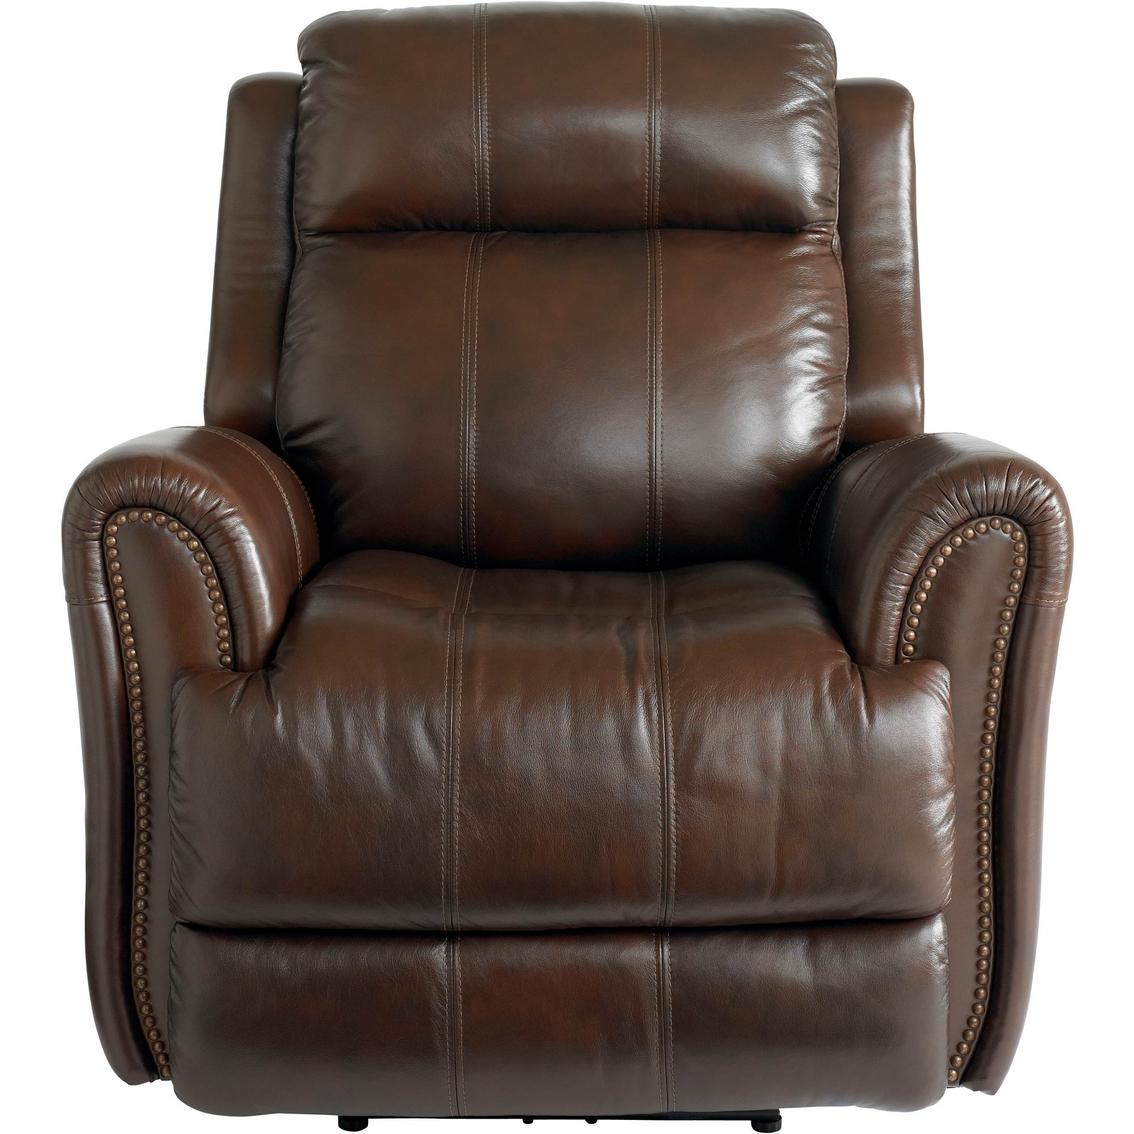 Groovy Bassett Club Level Marquee Wallsaver Power Recliner Chairs Machost Co Dining Chair Design Ideas Machostcouk